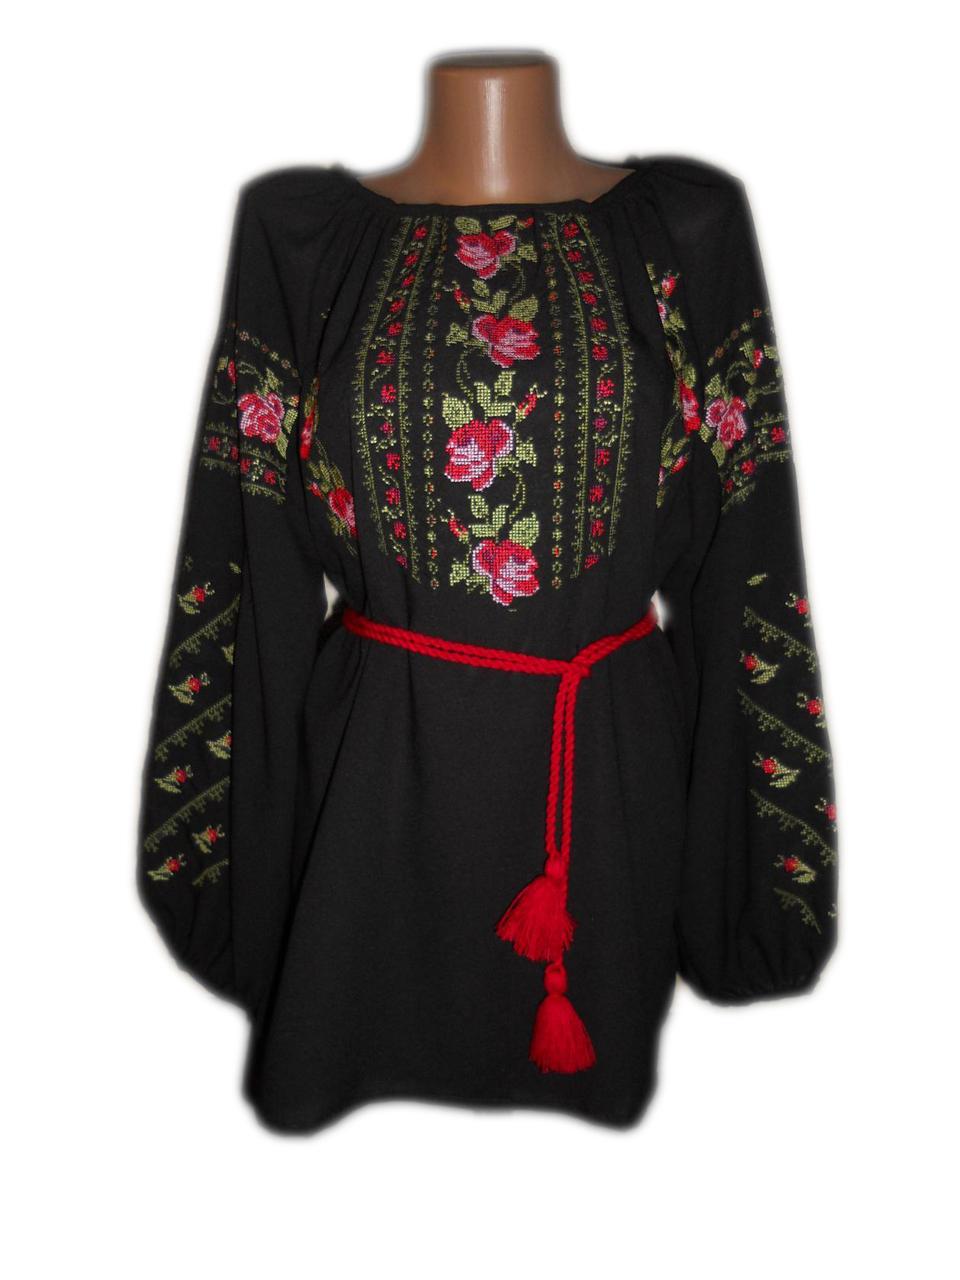 "Жіноча вишита сорочка (блузка) ""Кілен"" (Женская вышитая рубашка (блузка) ""Килен"") BN-0053"